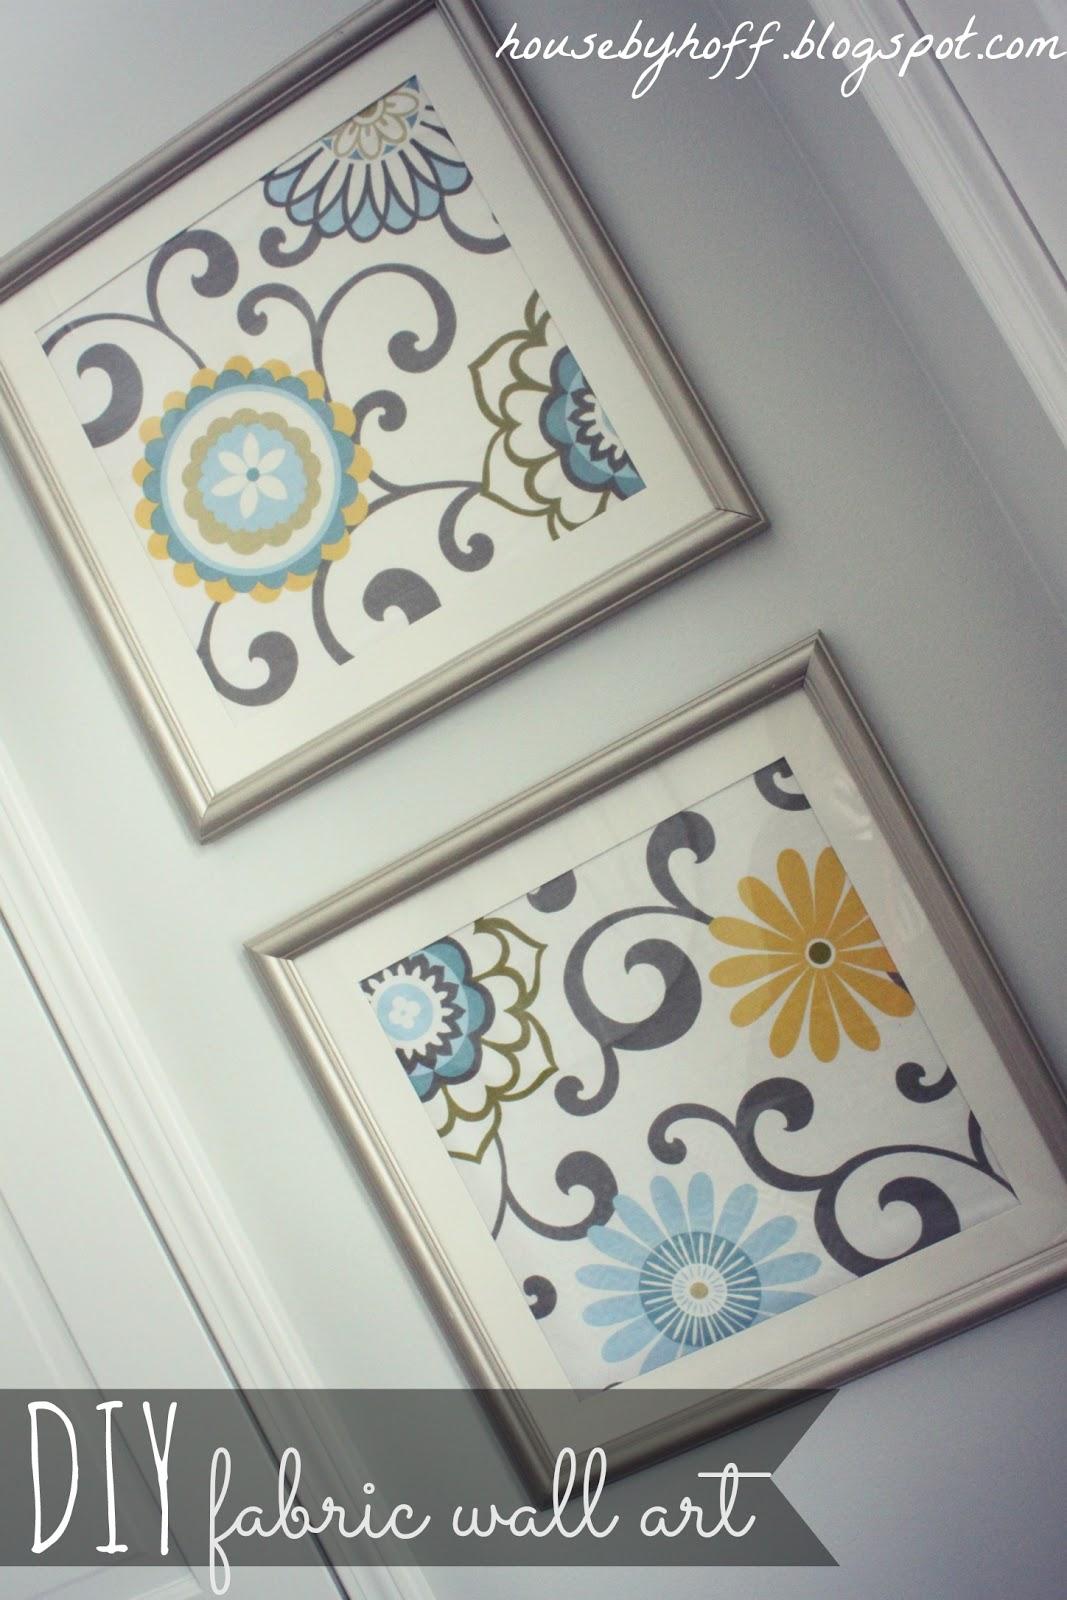 Diy Fabric Wall Art Pinterest : Diy fabric art house by hoff